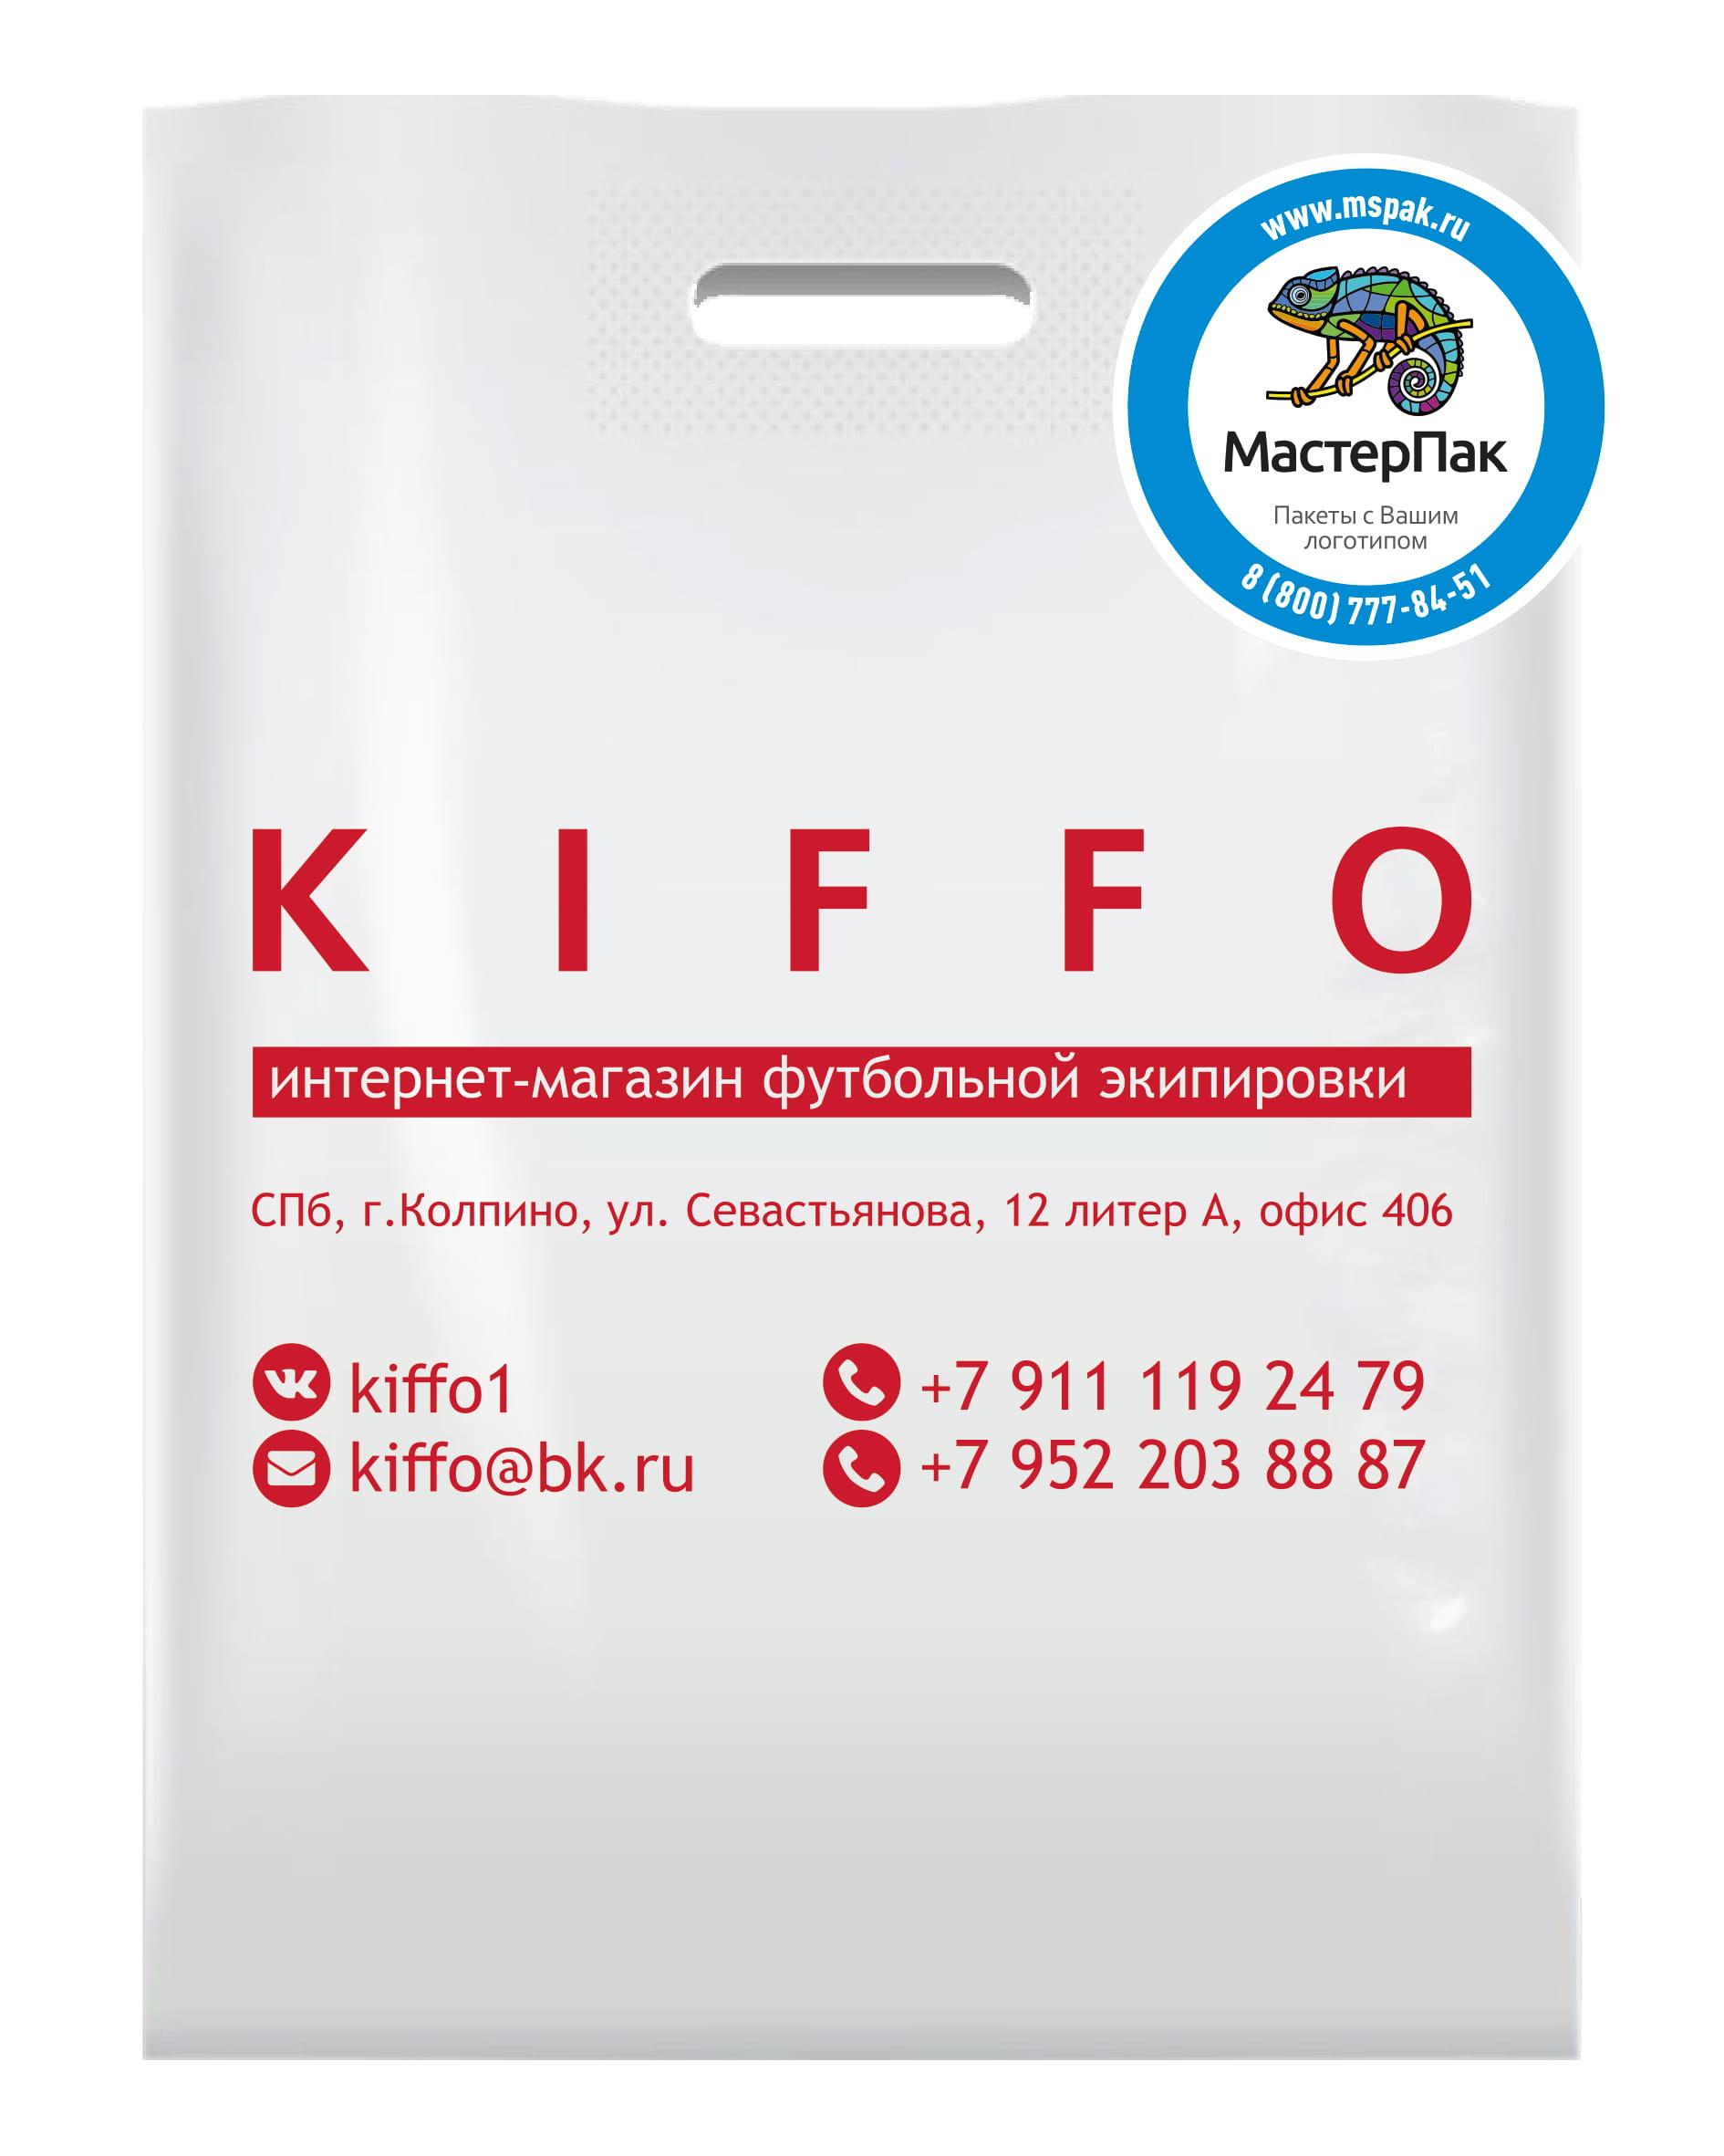 Пакет ПВД с логотипом Kiffo, Спб, 70 мкм, 30*40, усиленная ручка